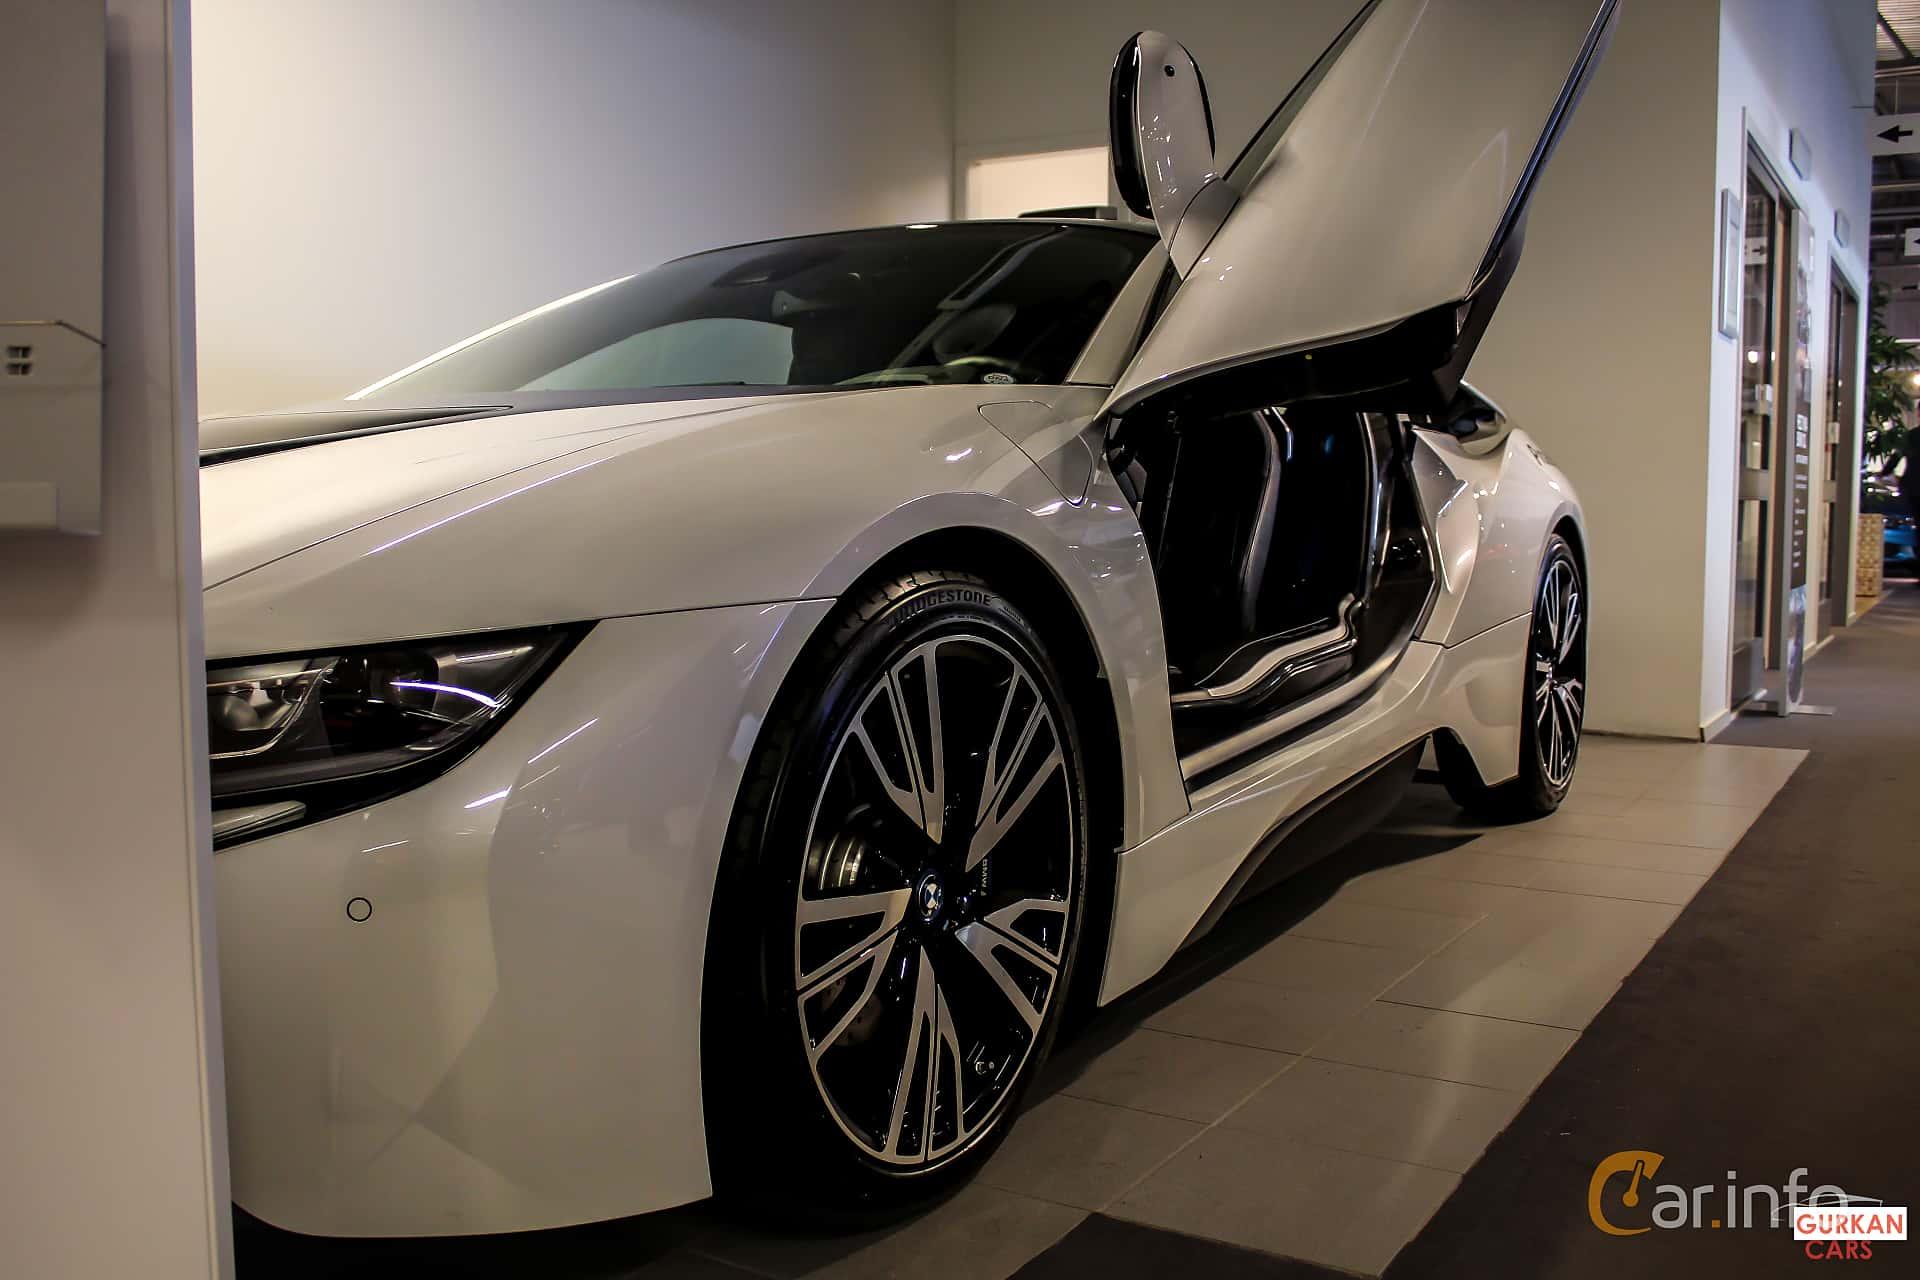 BMW i8 1.5 + 7.1 kWh Steptronic, 362hk, 2014